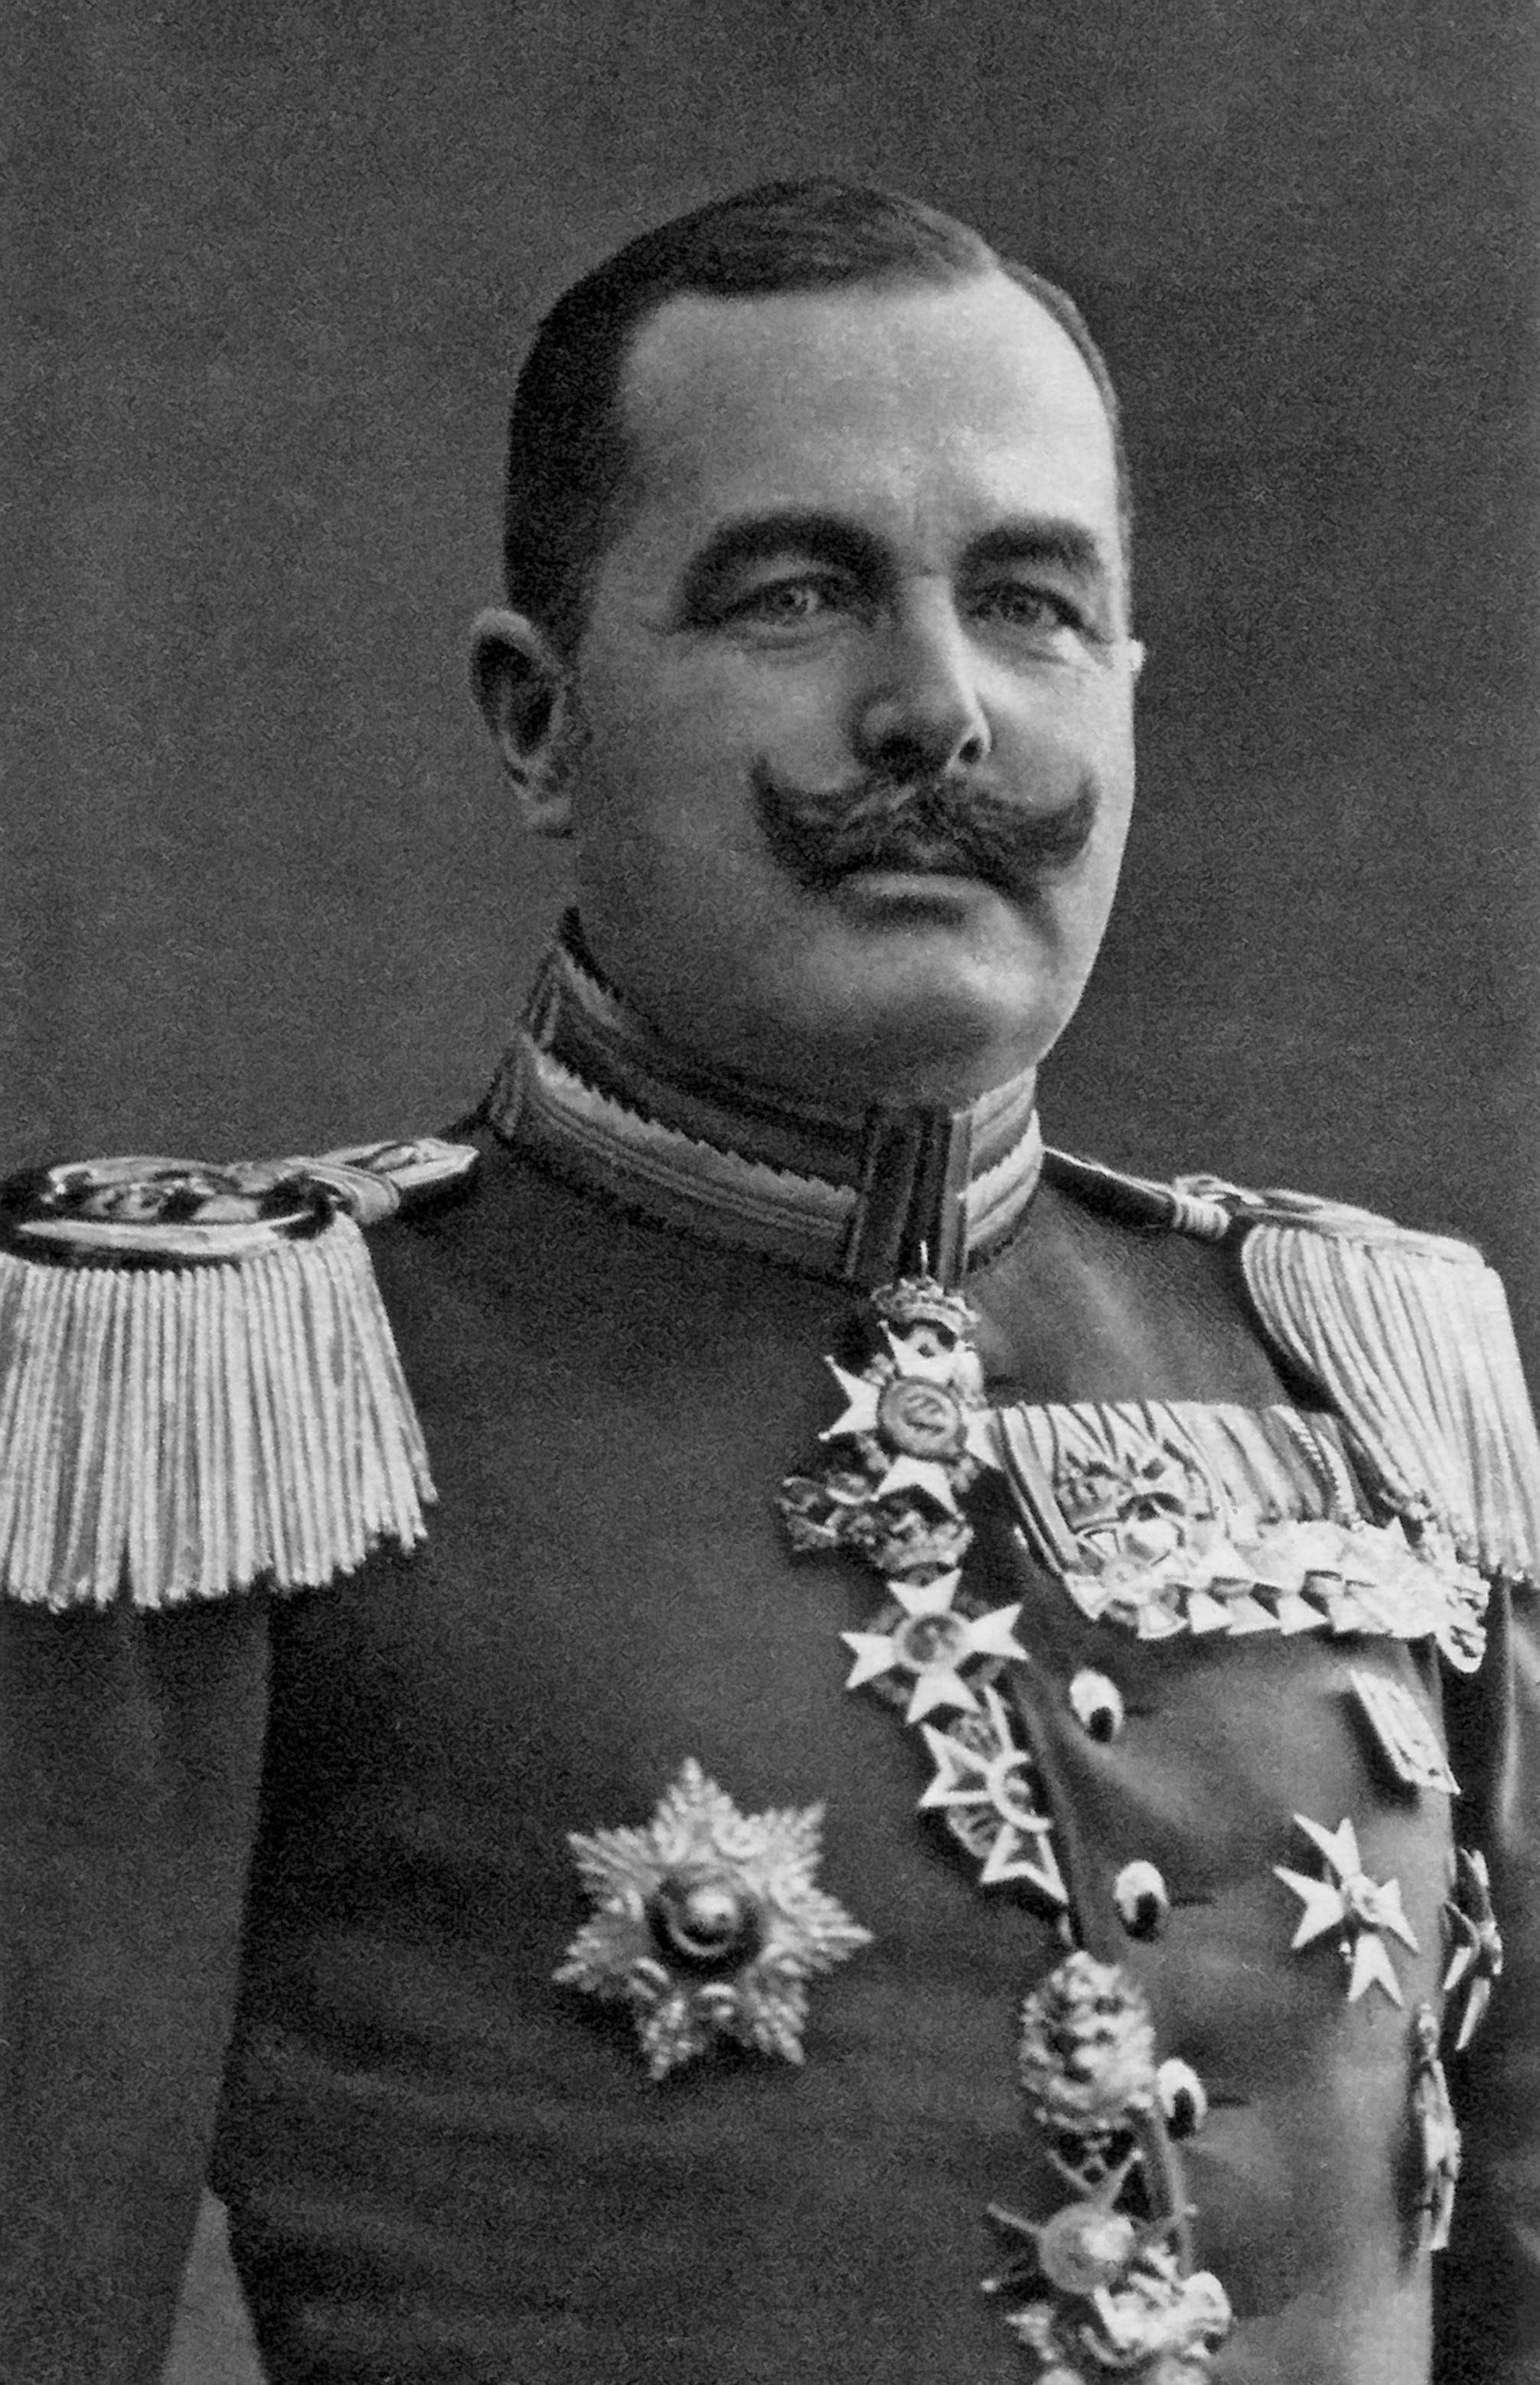 File:AdolfWildVonHohenborn jpg - Wikimedia Commons